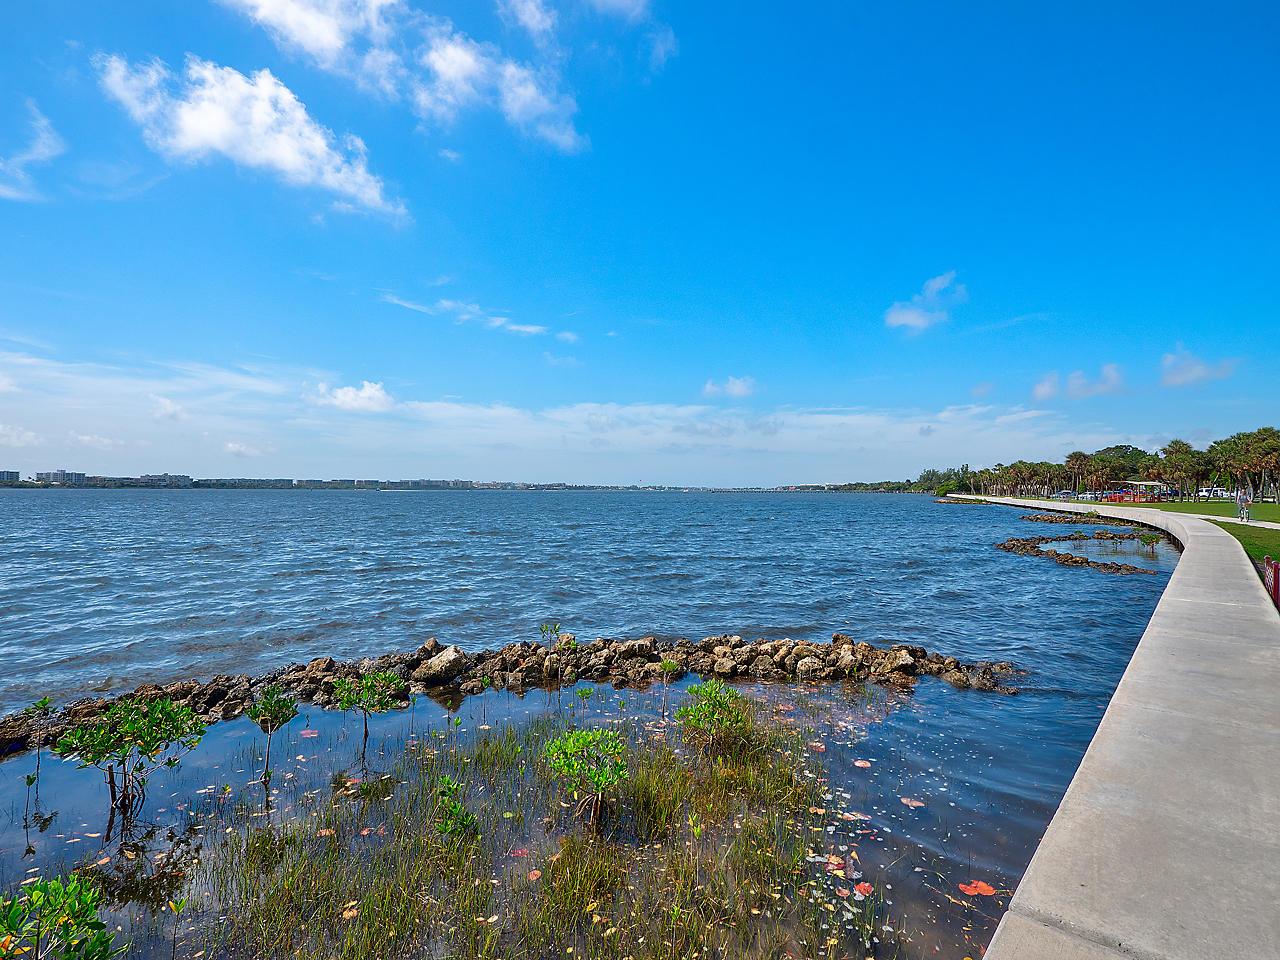 208 S Lakeside 202 Drive 202 Lake Worth, FL 33460